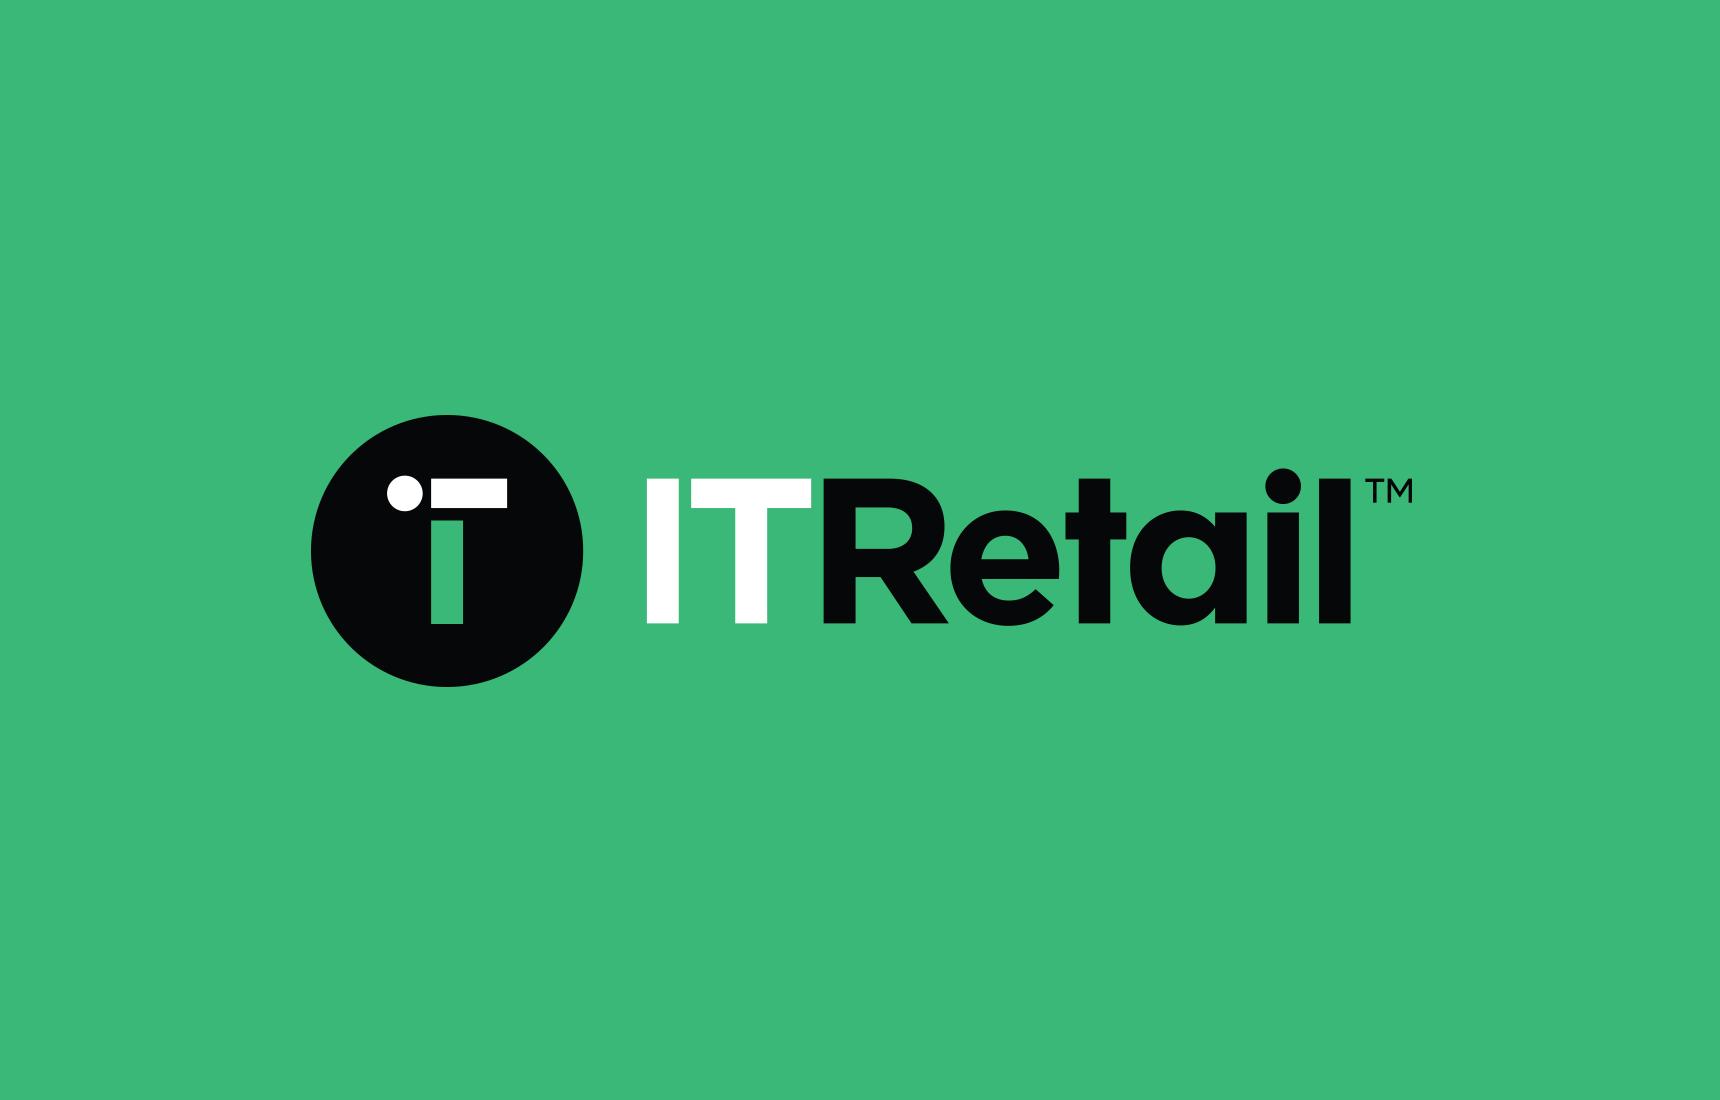 IT Retail logo in green background.